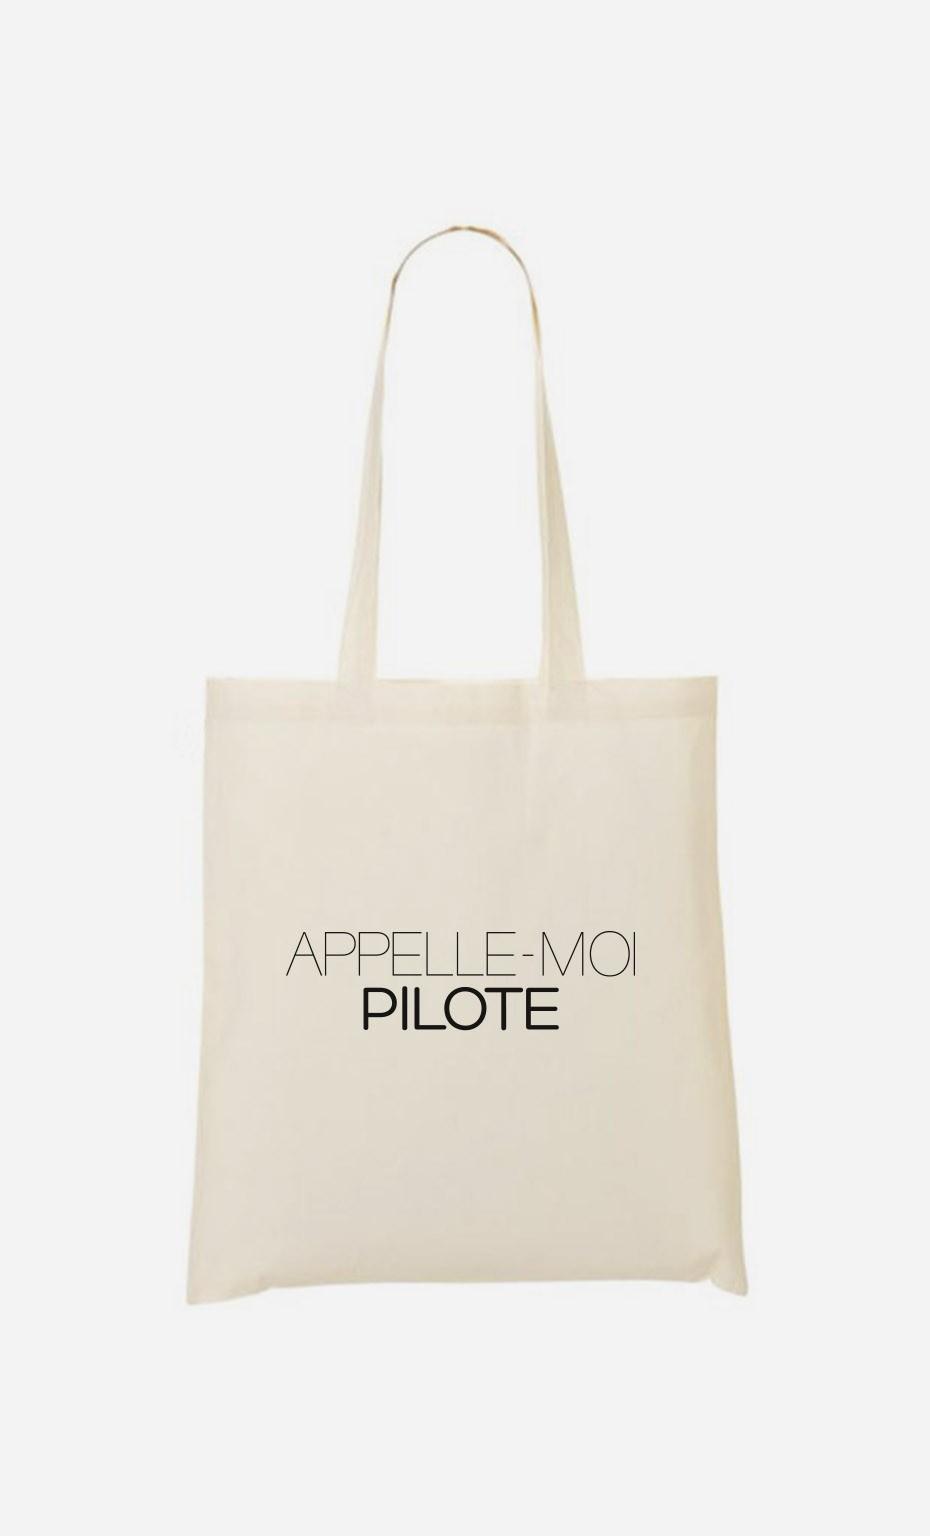 Tote Bag Appelle-Moi Pilote